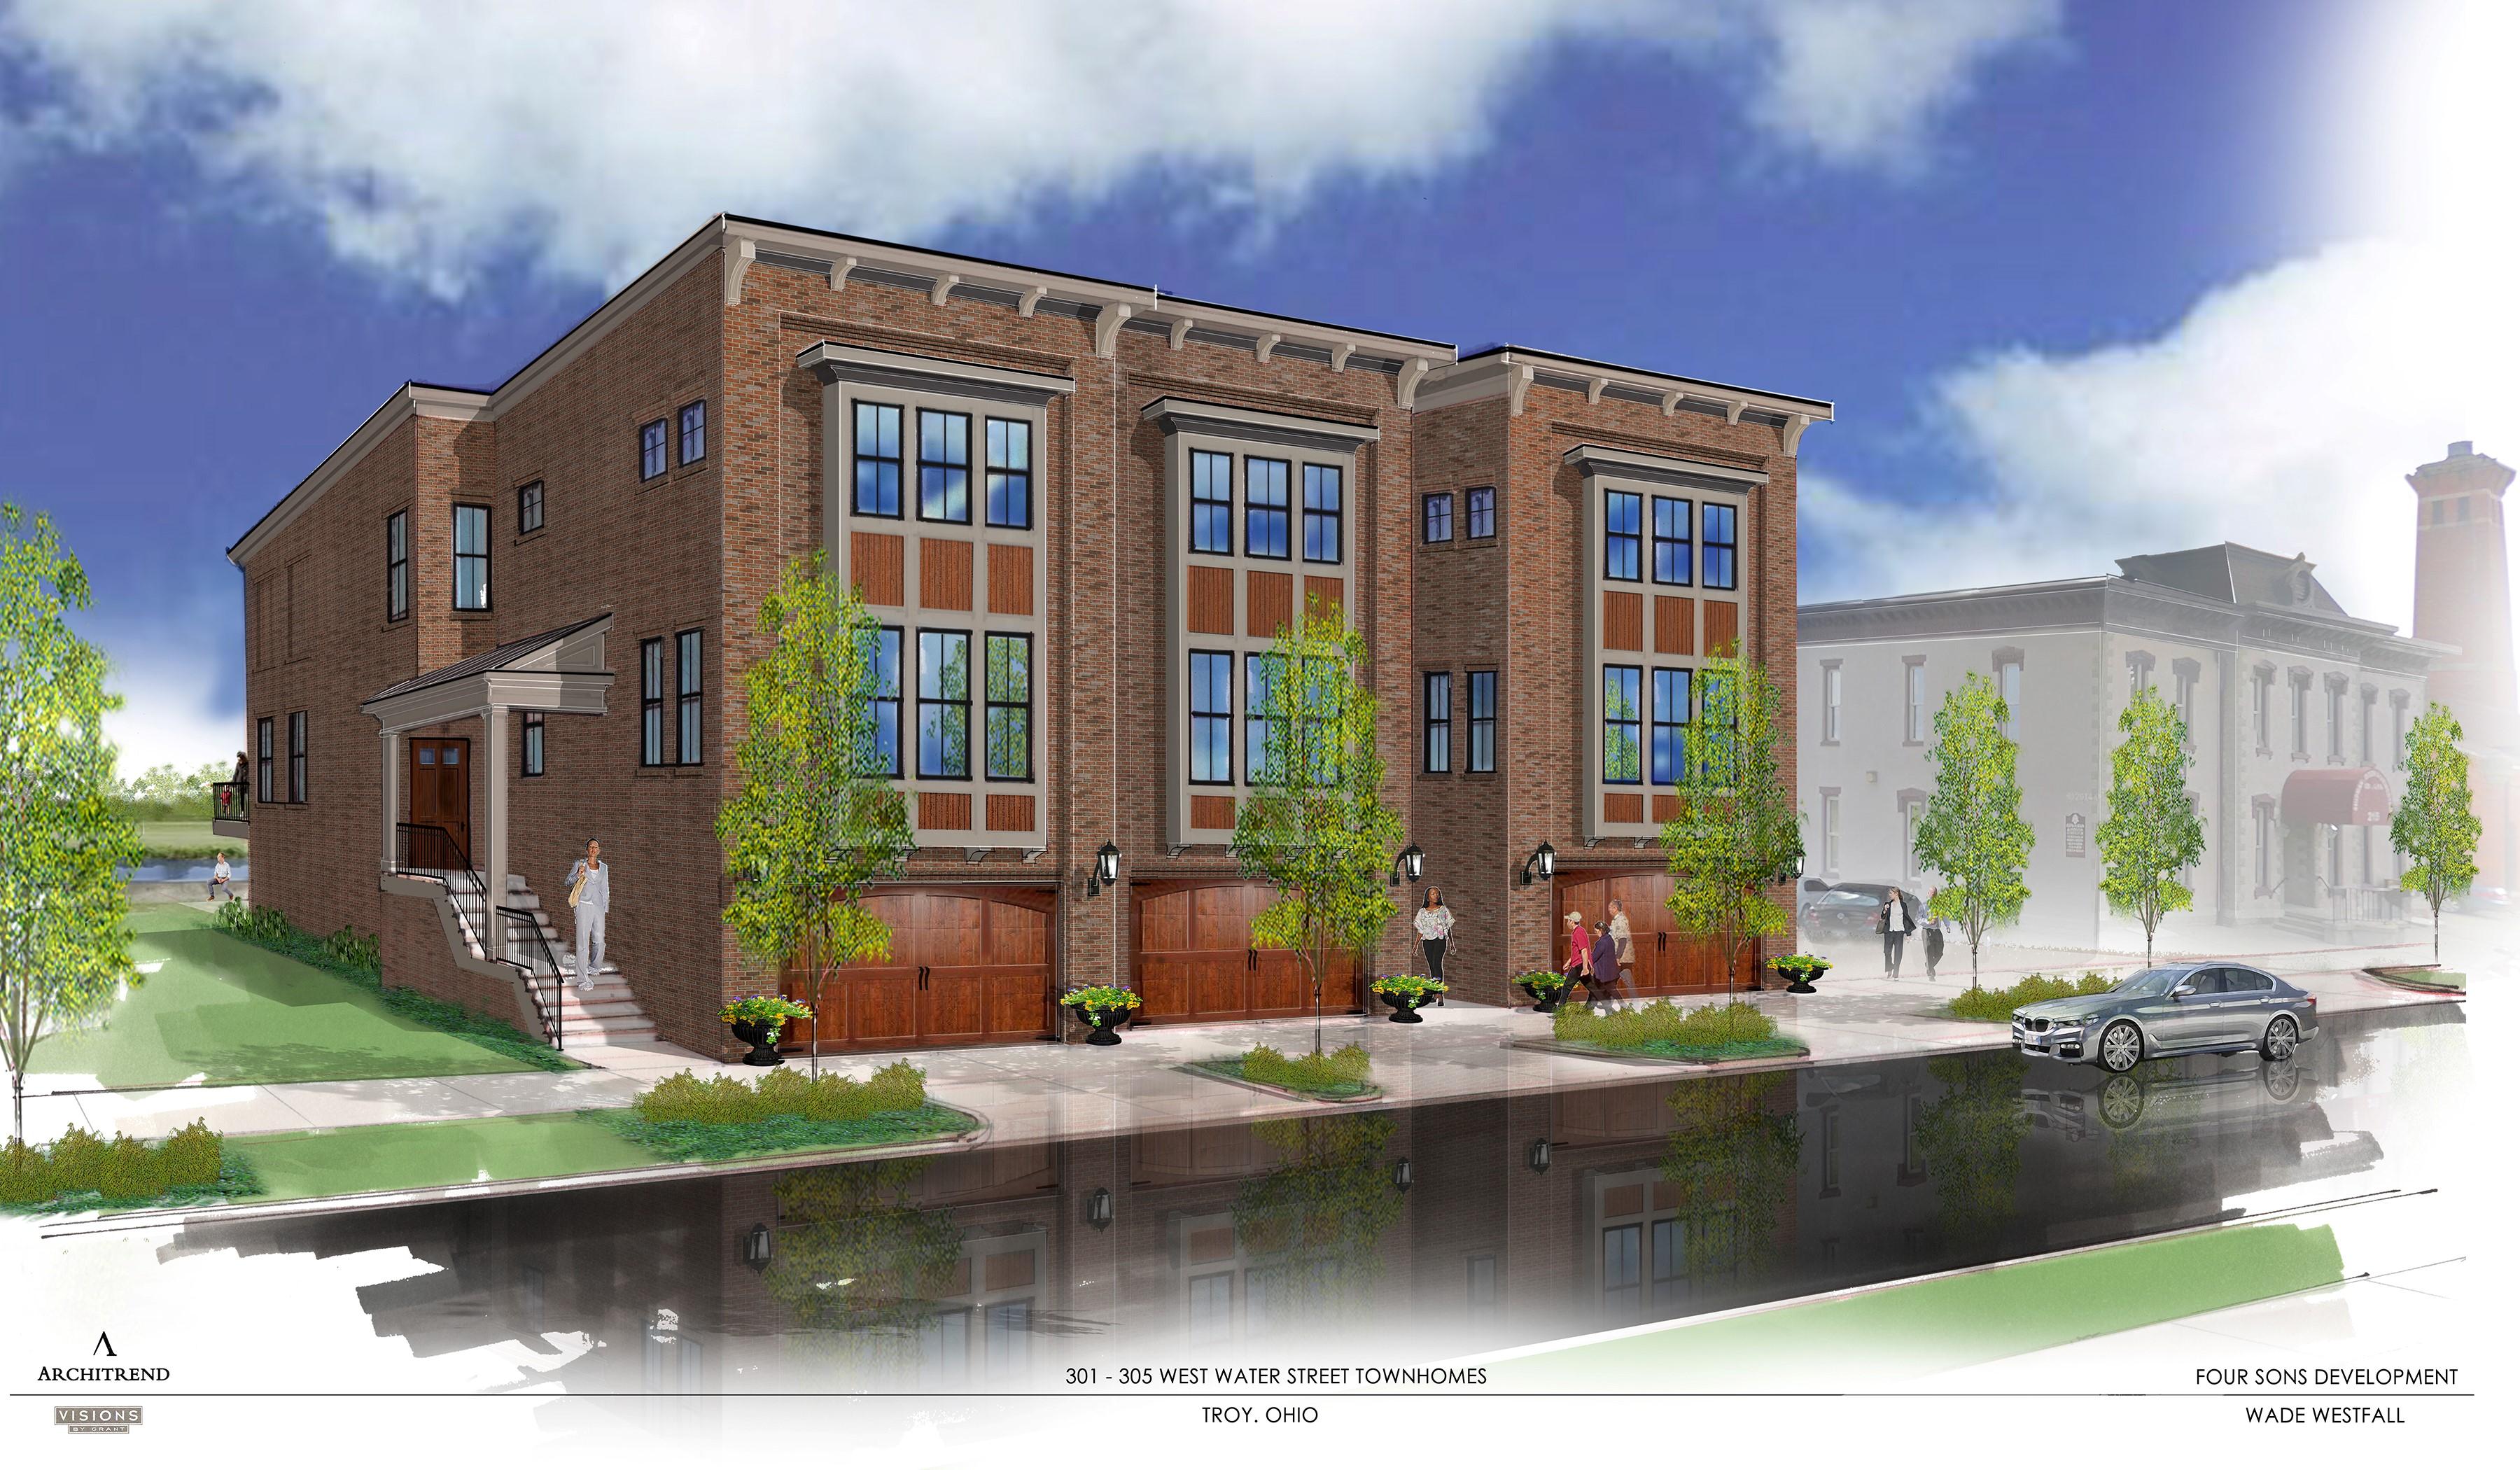 Troy building downtown housing to meet millennial demand